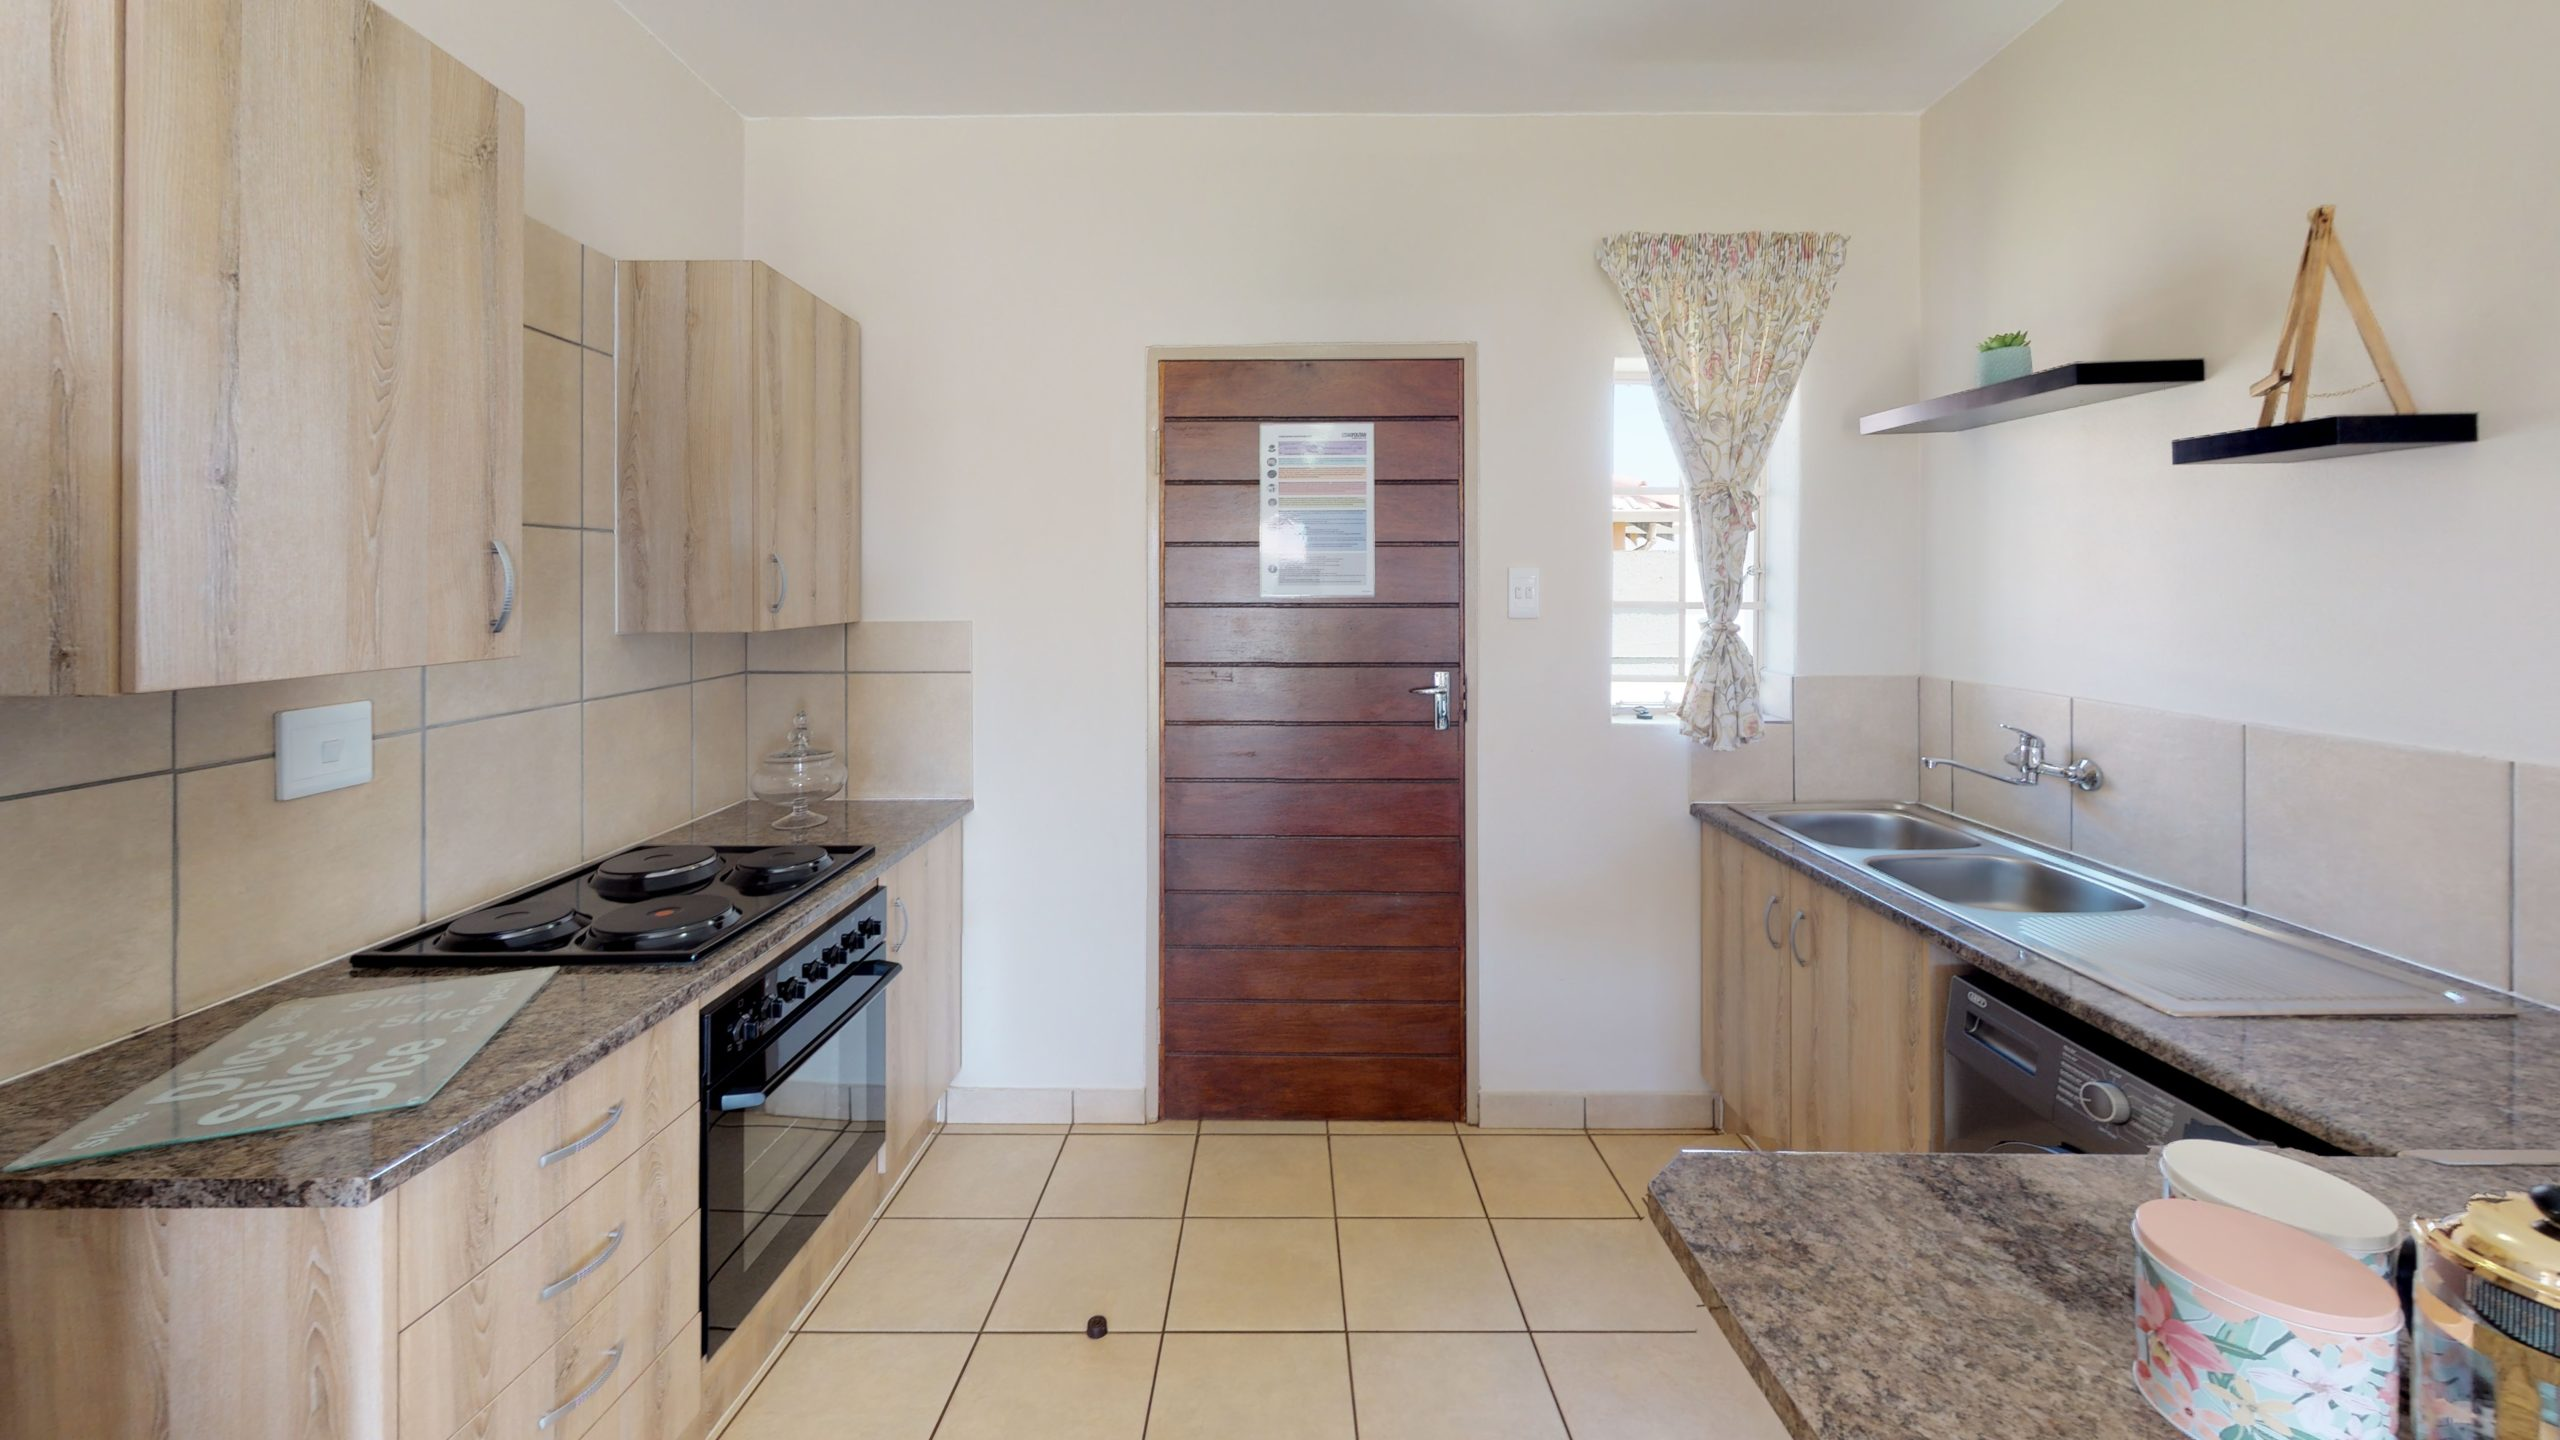 Sky City, Homes for Sale in Alberton, Gauteng - Kitchen